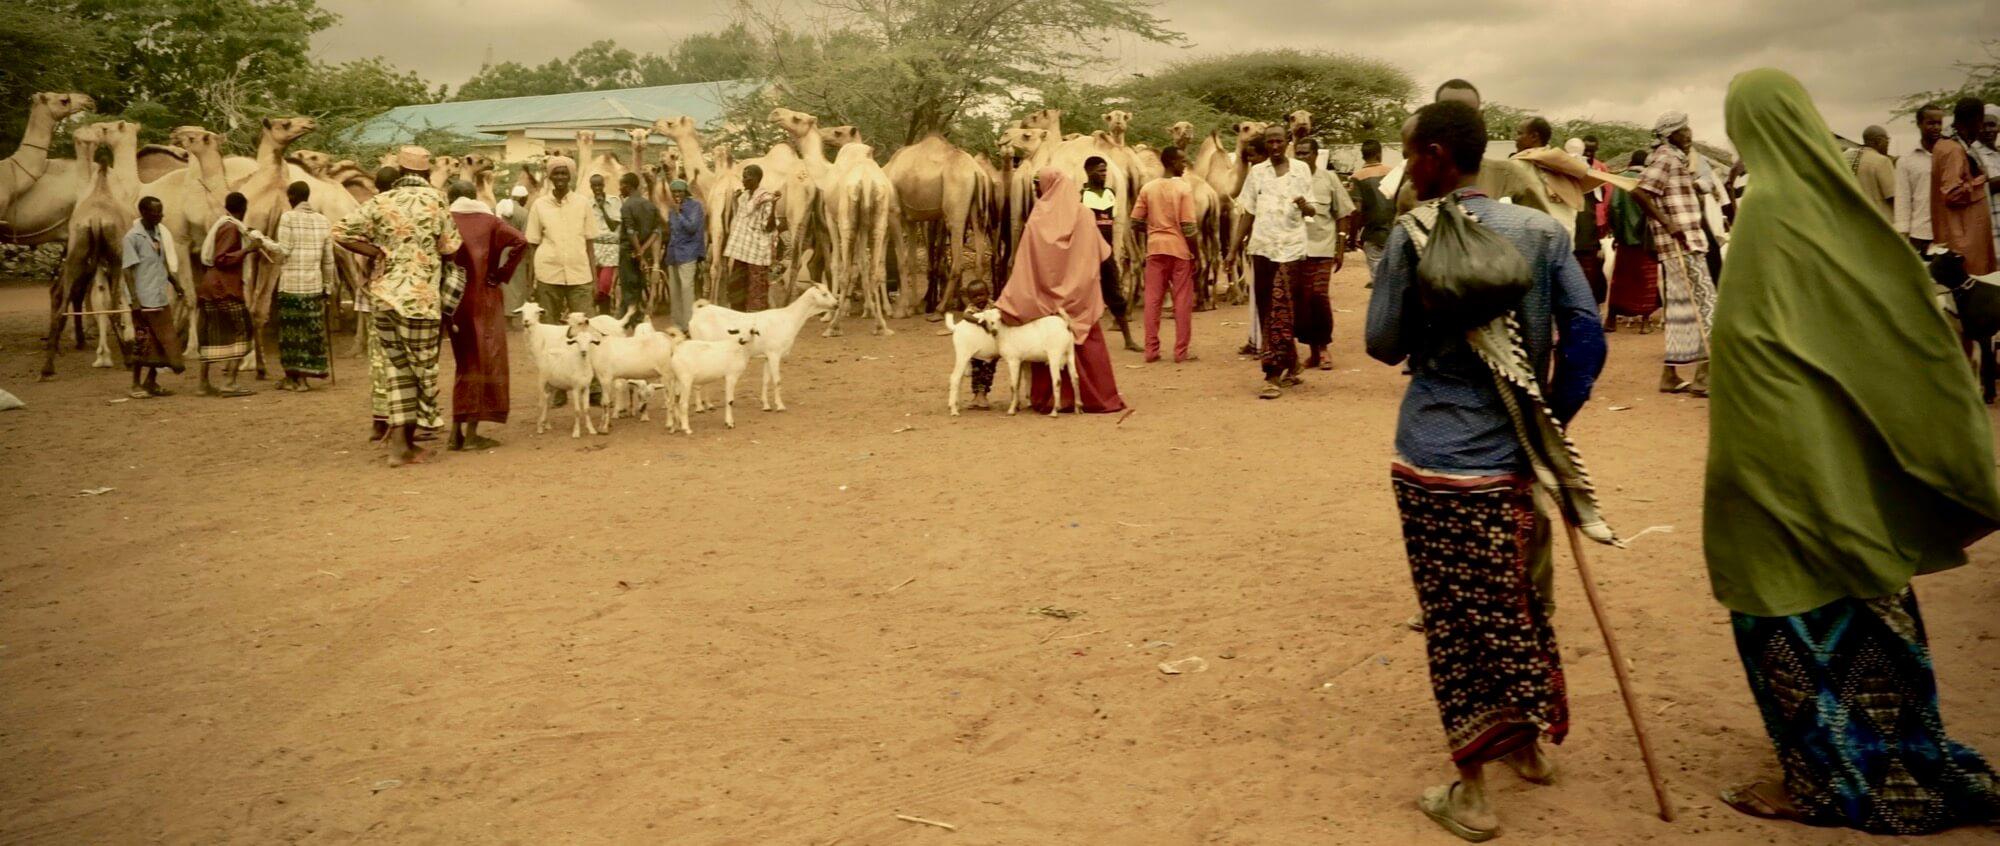 A Camel market in Dadaab refugee camp